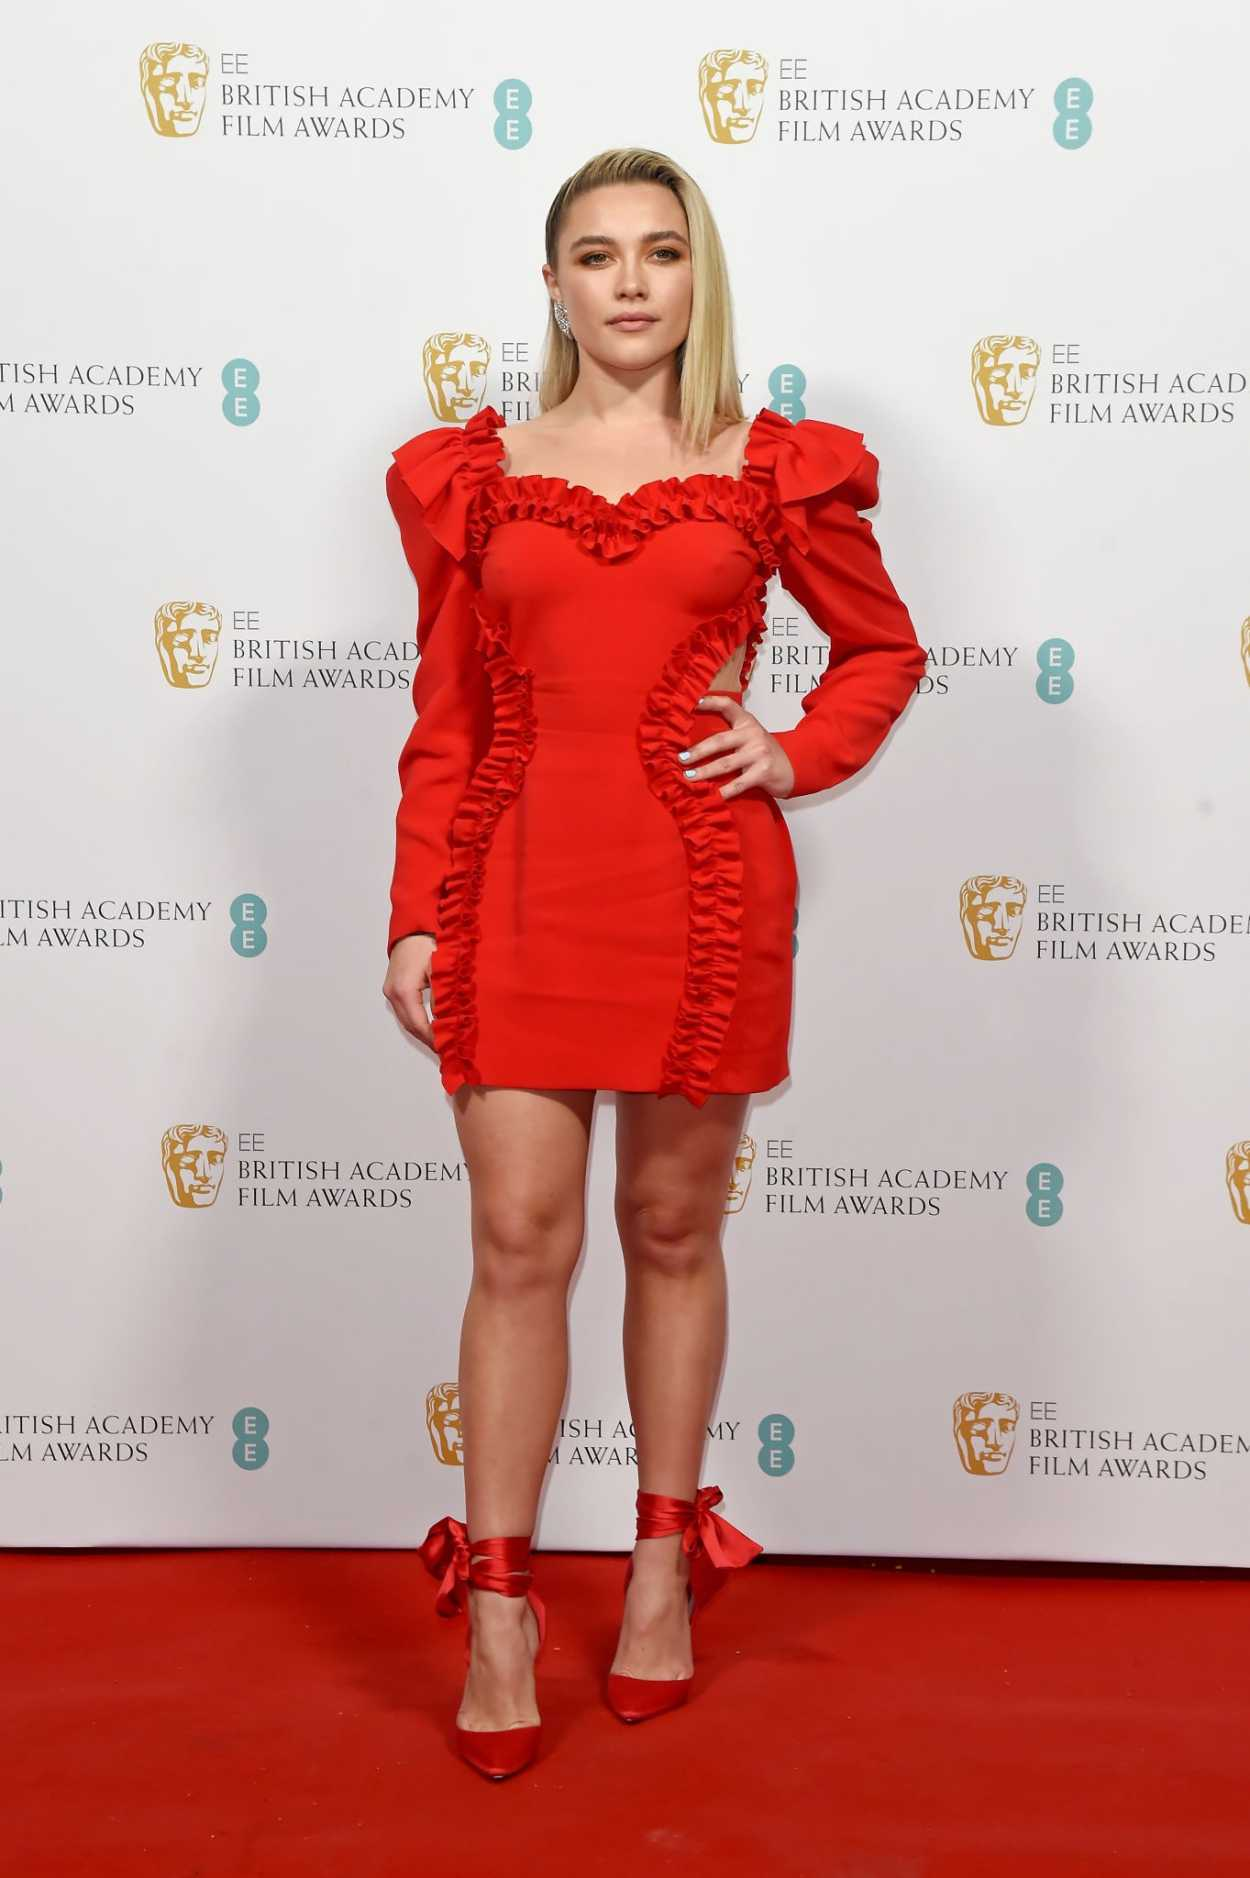 Florence Pugh Attends 2020 EE British Academy Film Awards